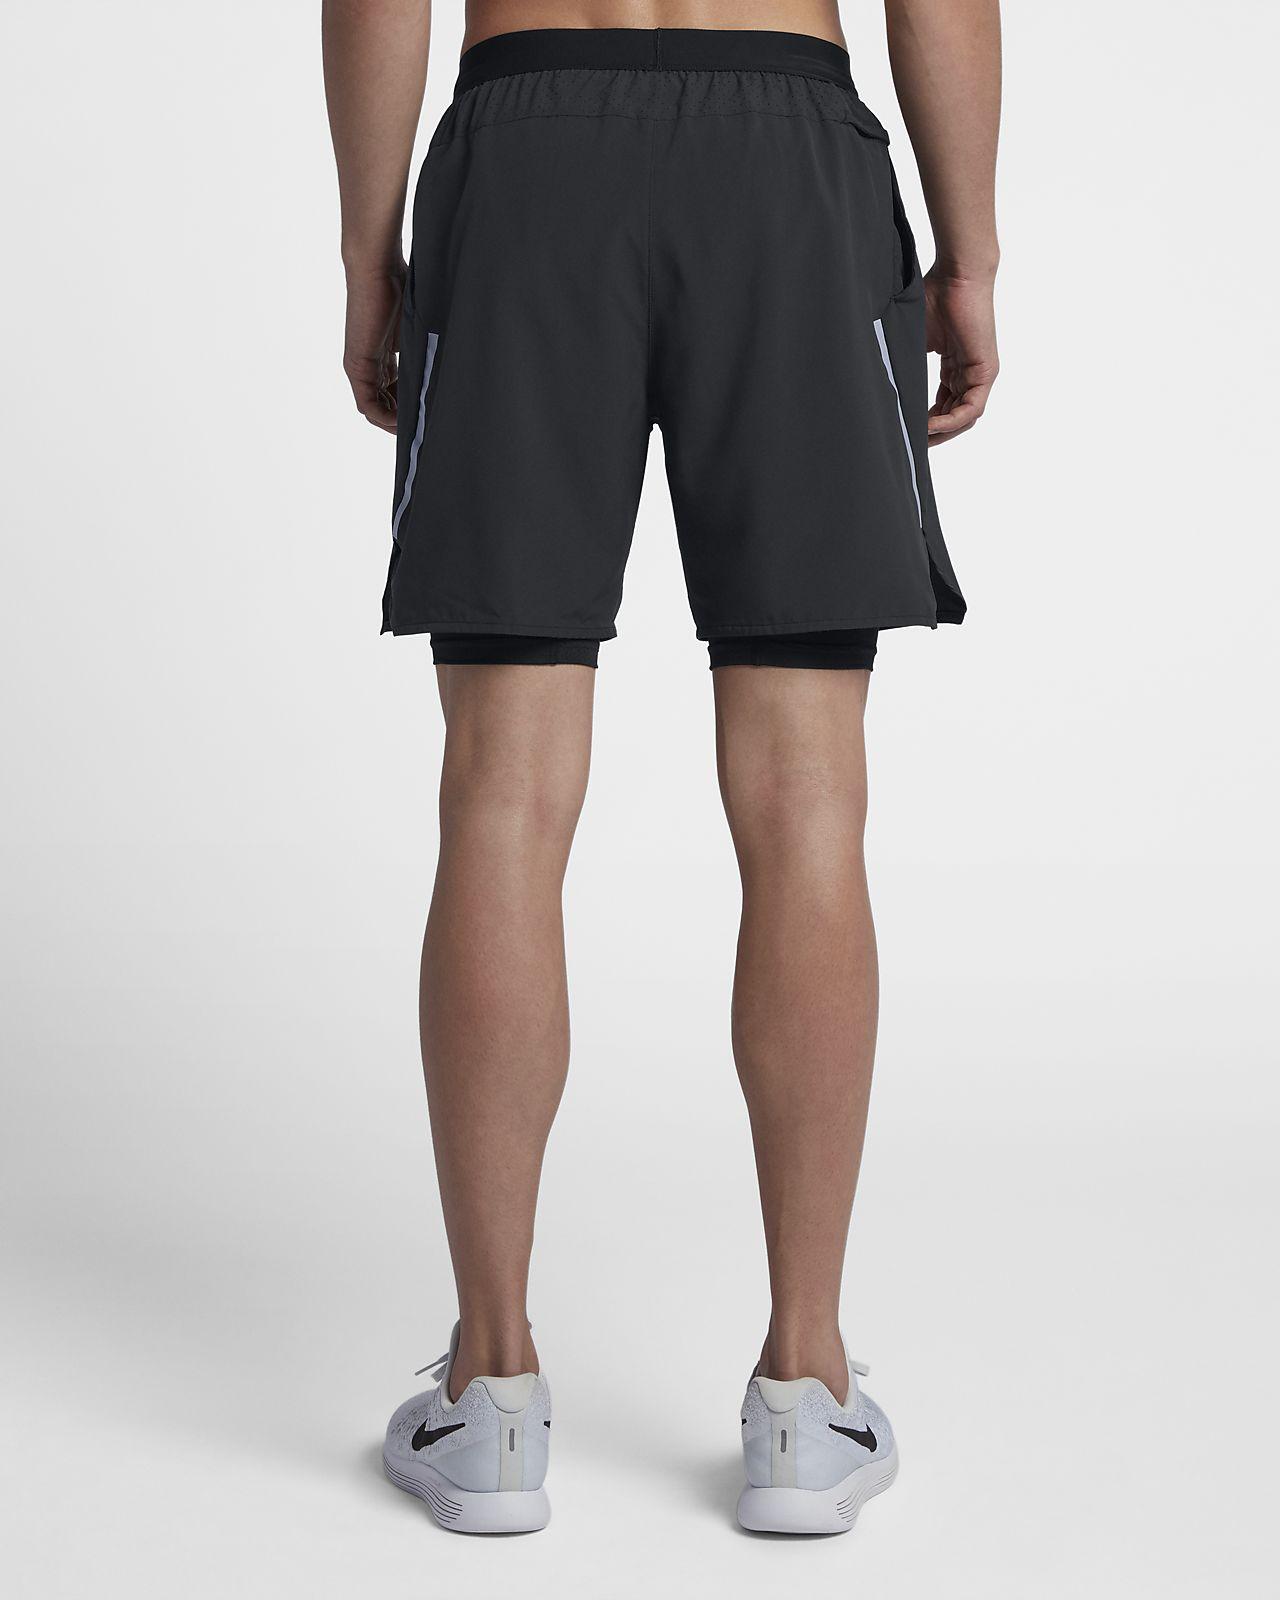 promo code d77c9 fd98b Nike Distance 2-in-1 Men s 7